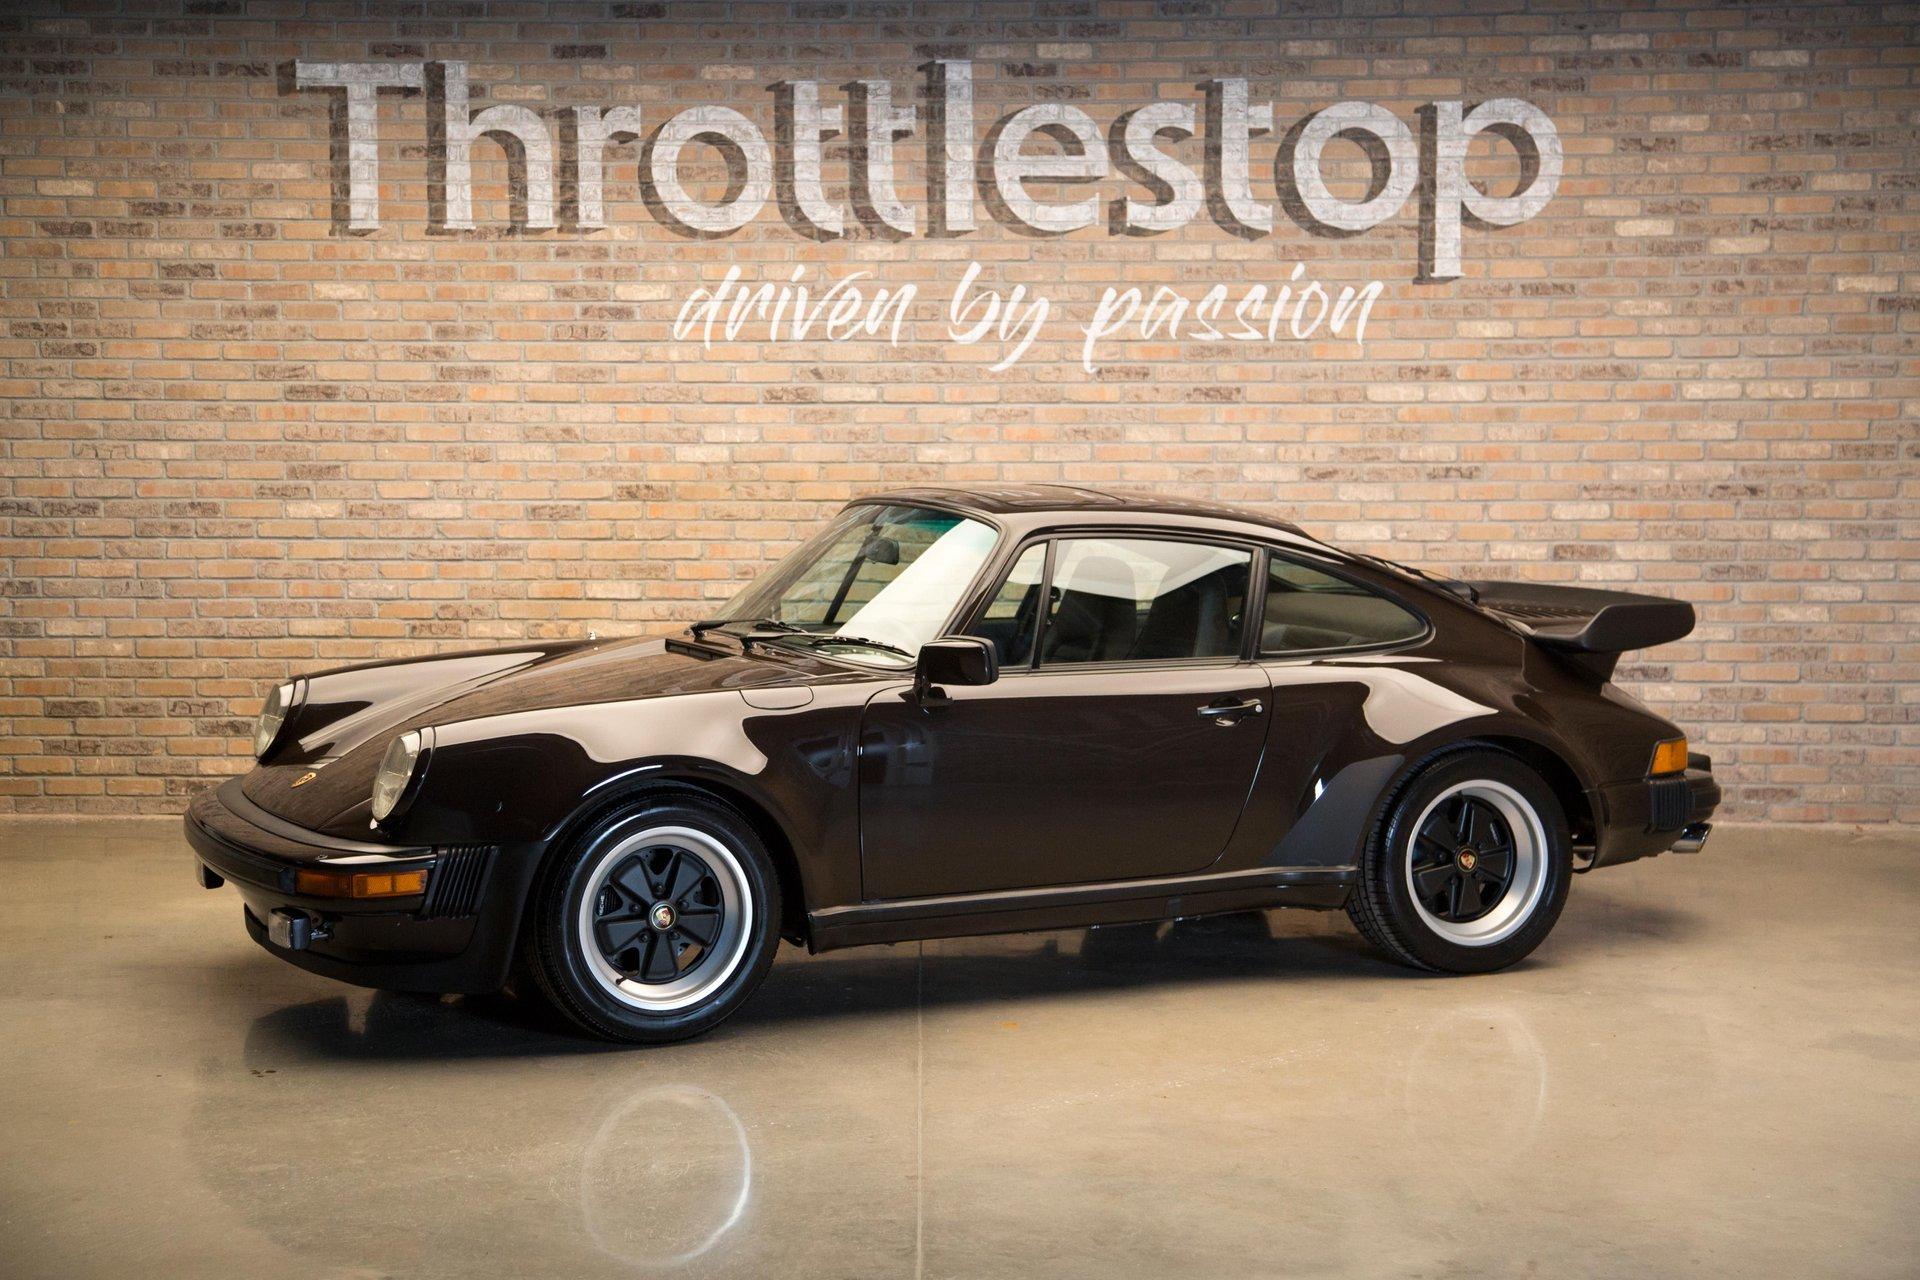 1978 porsche 911 turbo 930 coupe